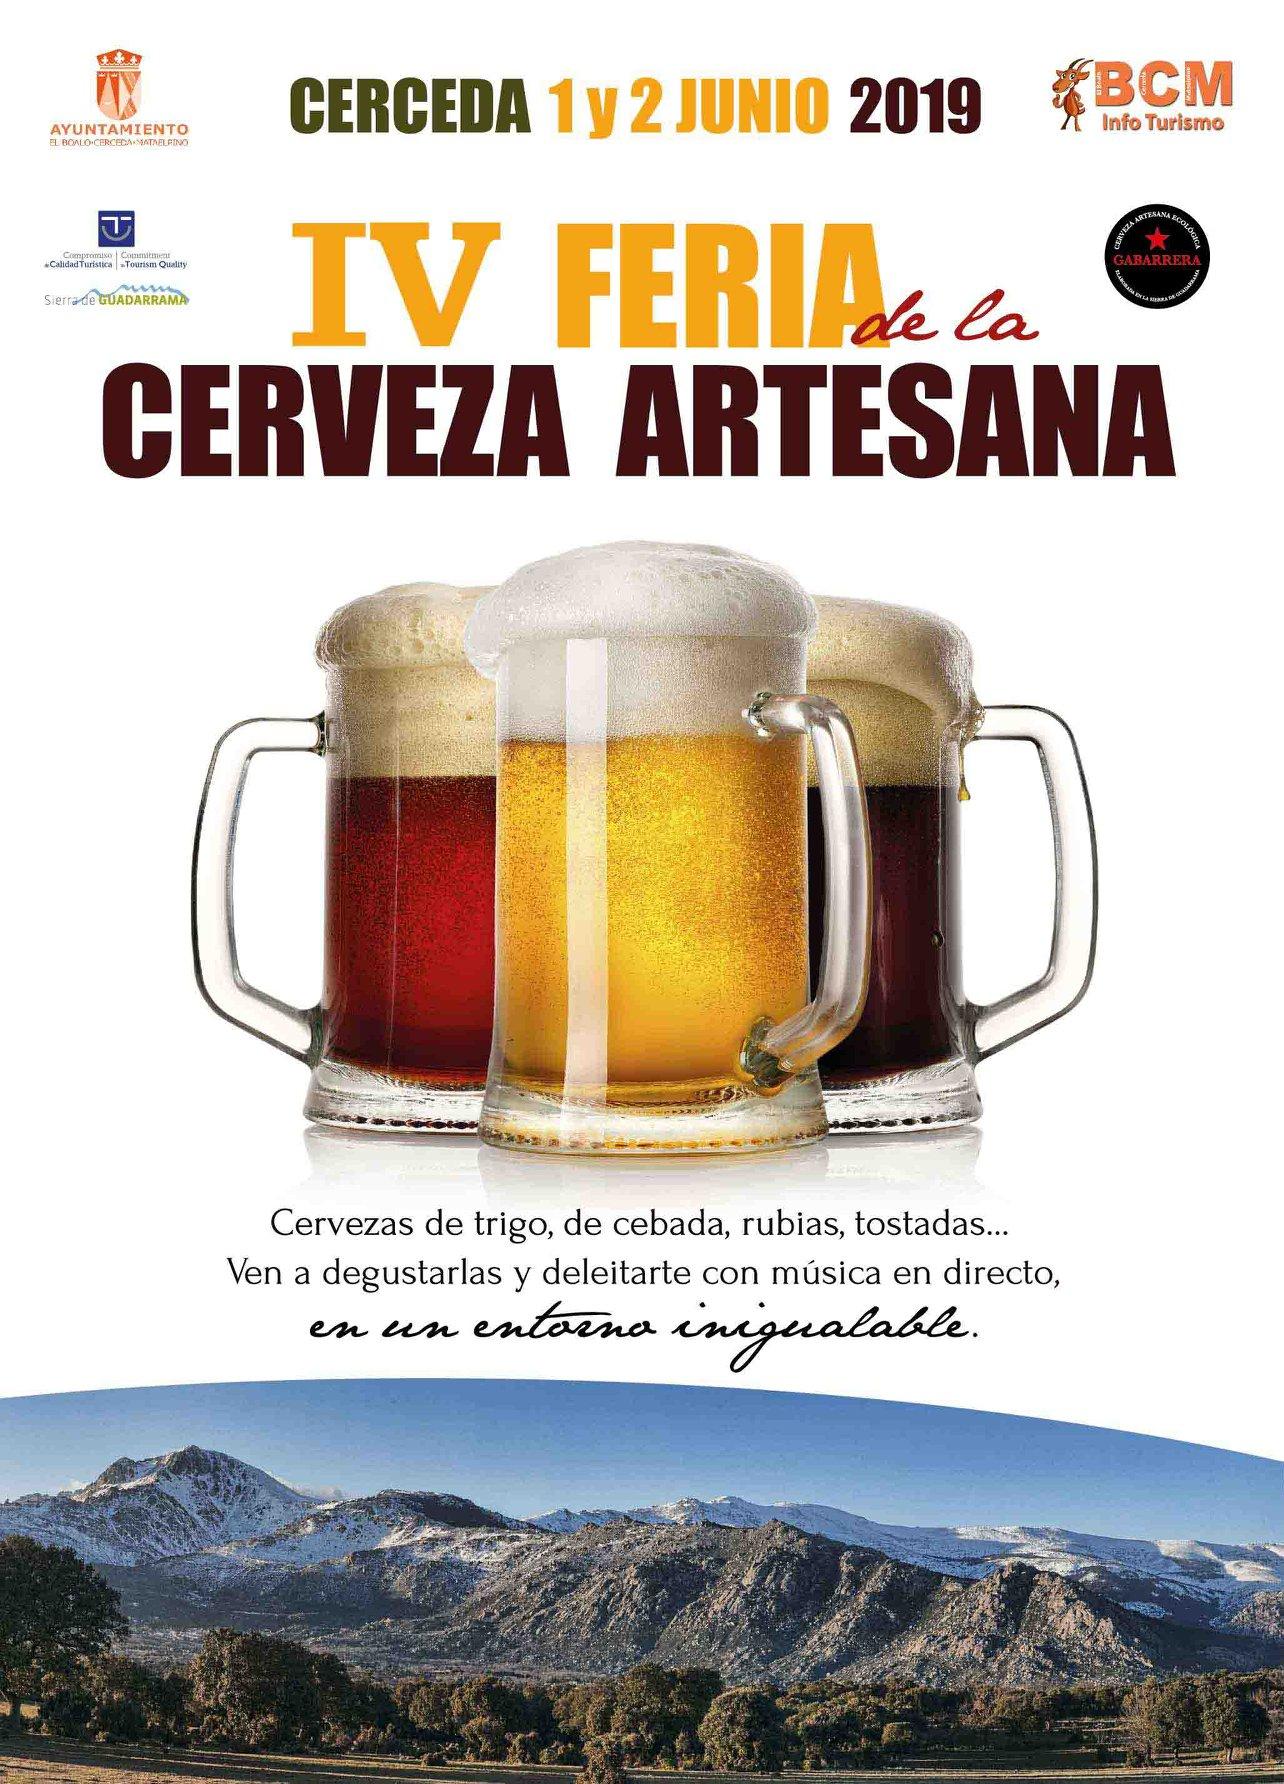 Cervezas Leoncia estará en la Feria de la Cerveza artesana de Cerceda 2019